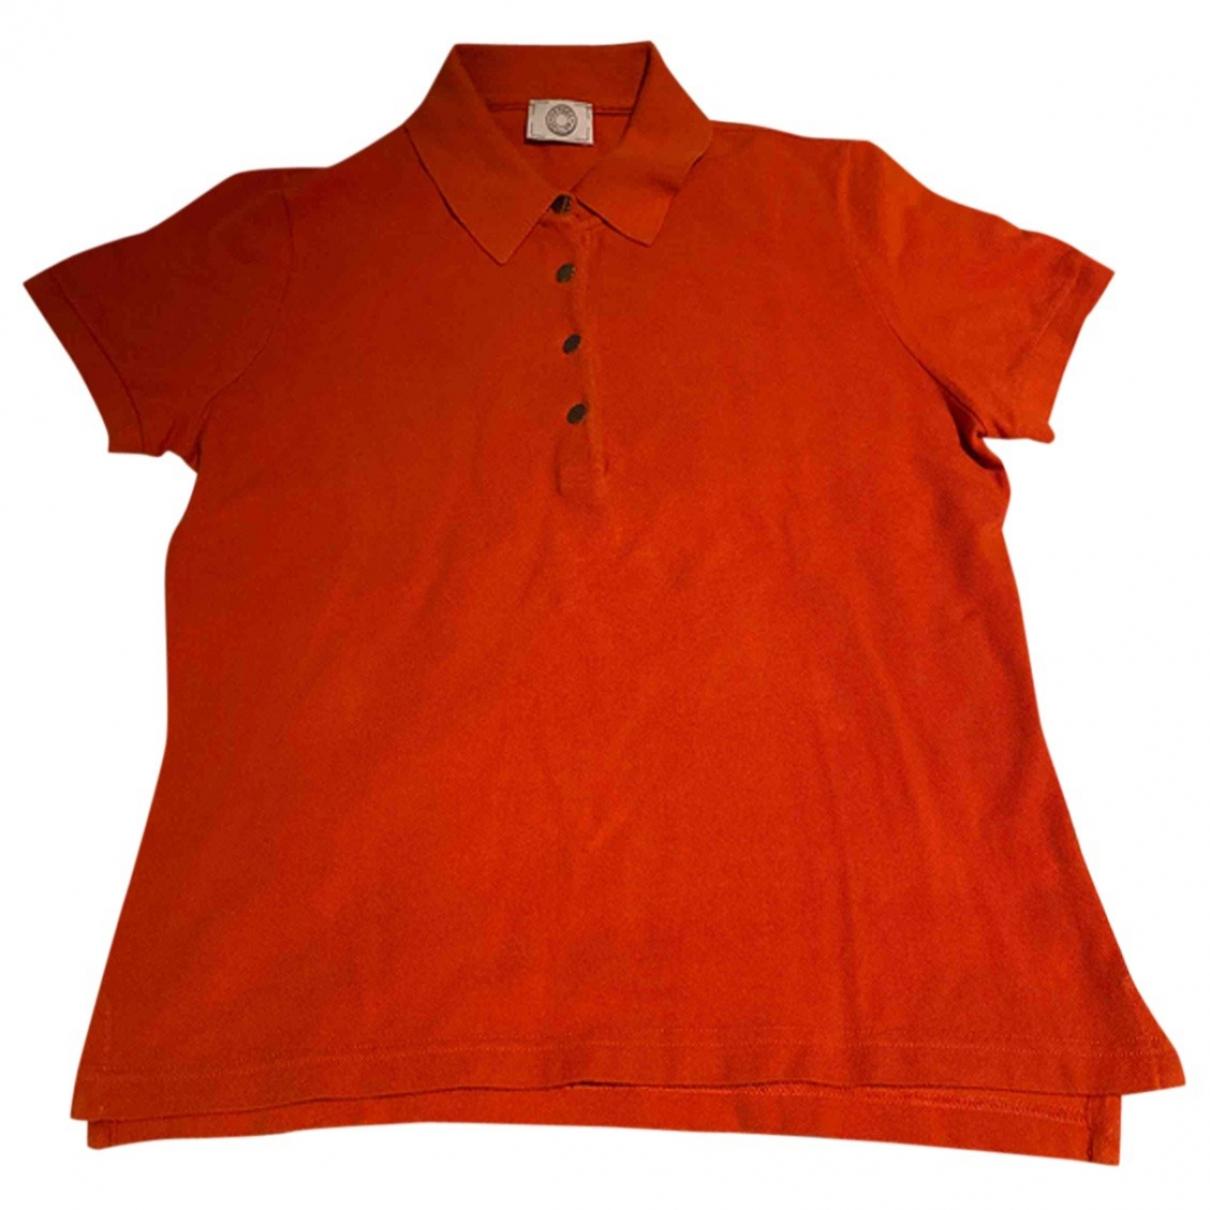 Top en Algodon Naranja Hermes